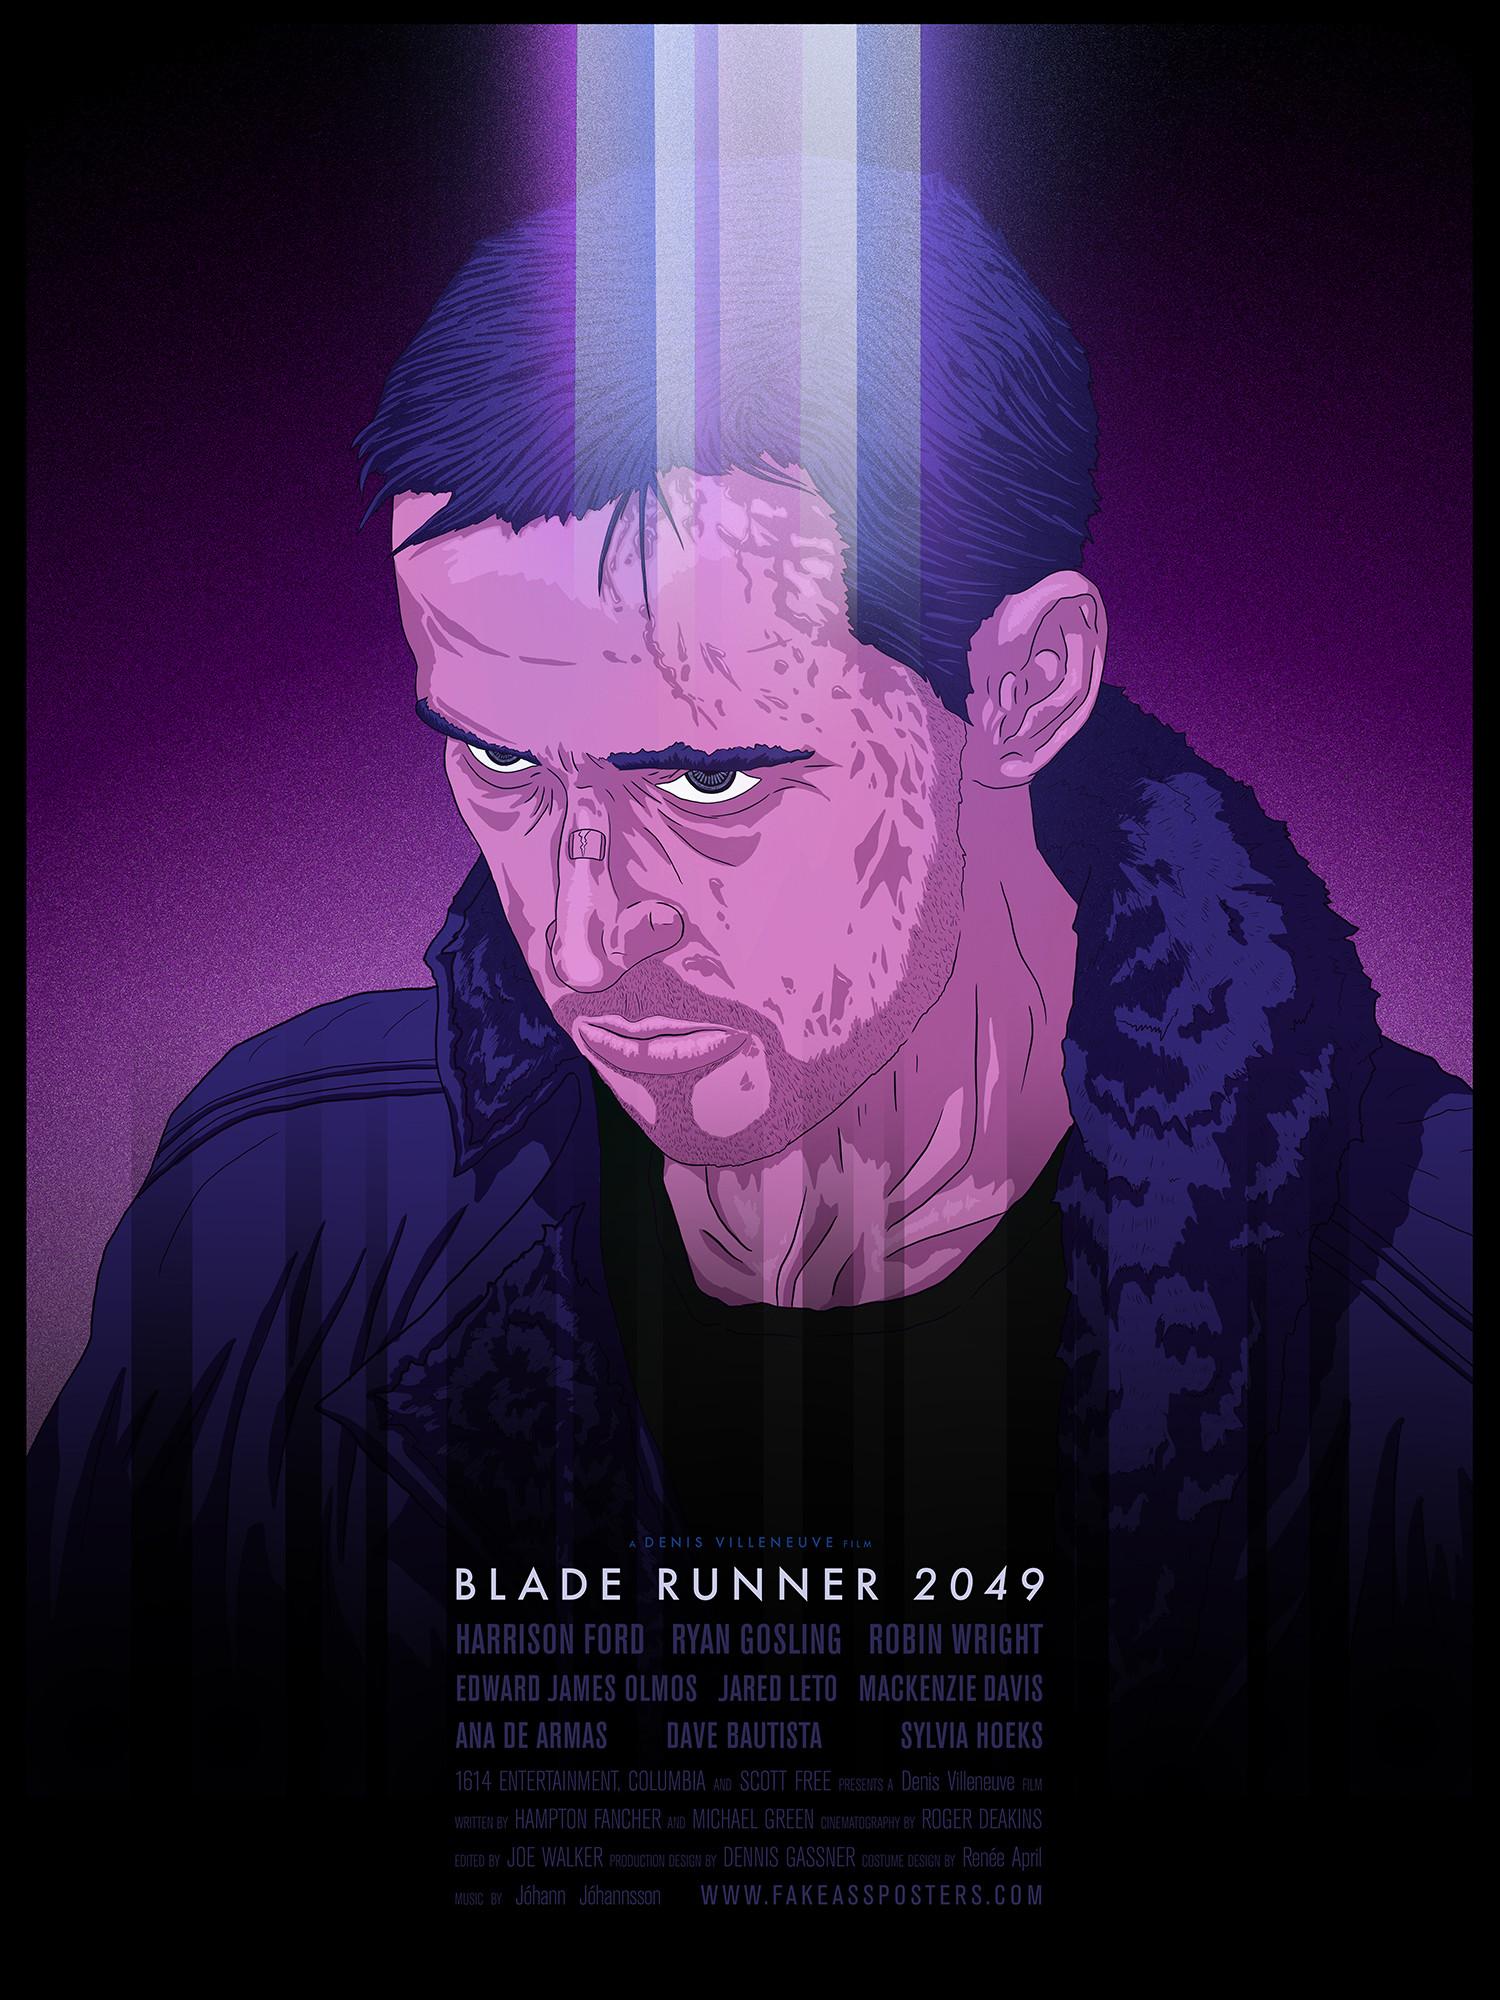 Blade Runner 2049 (2017) – hand drawn. HD Wallpaper From Gallsource.com